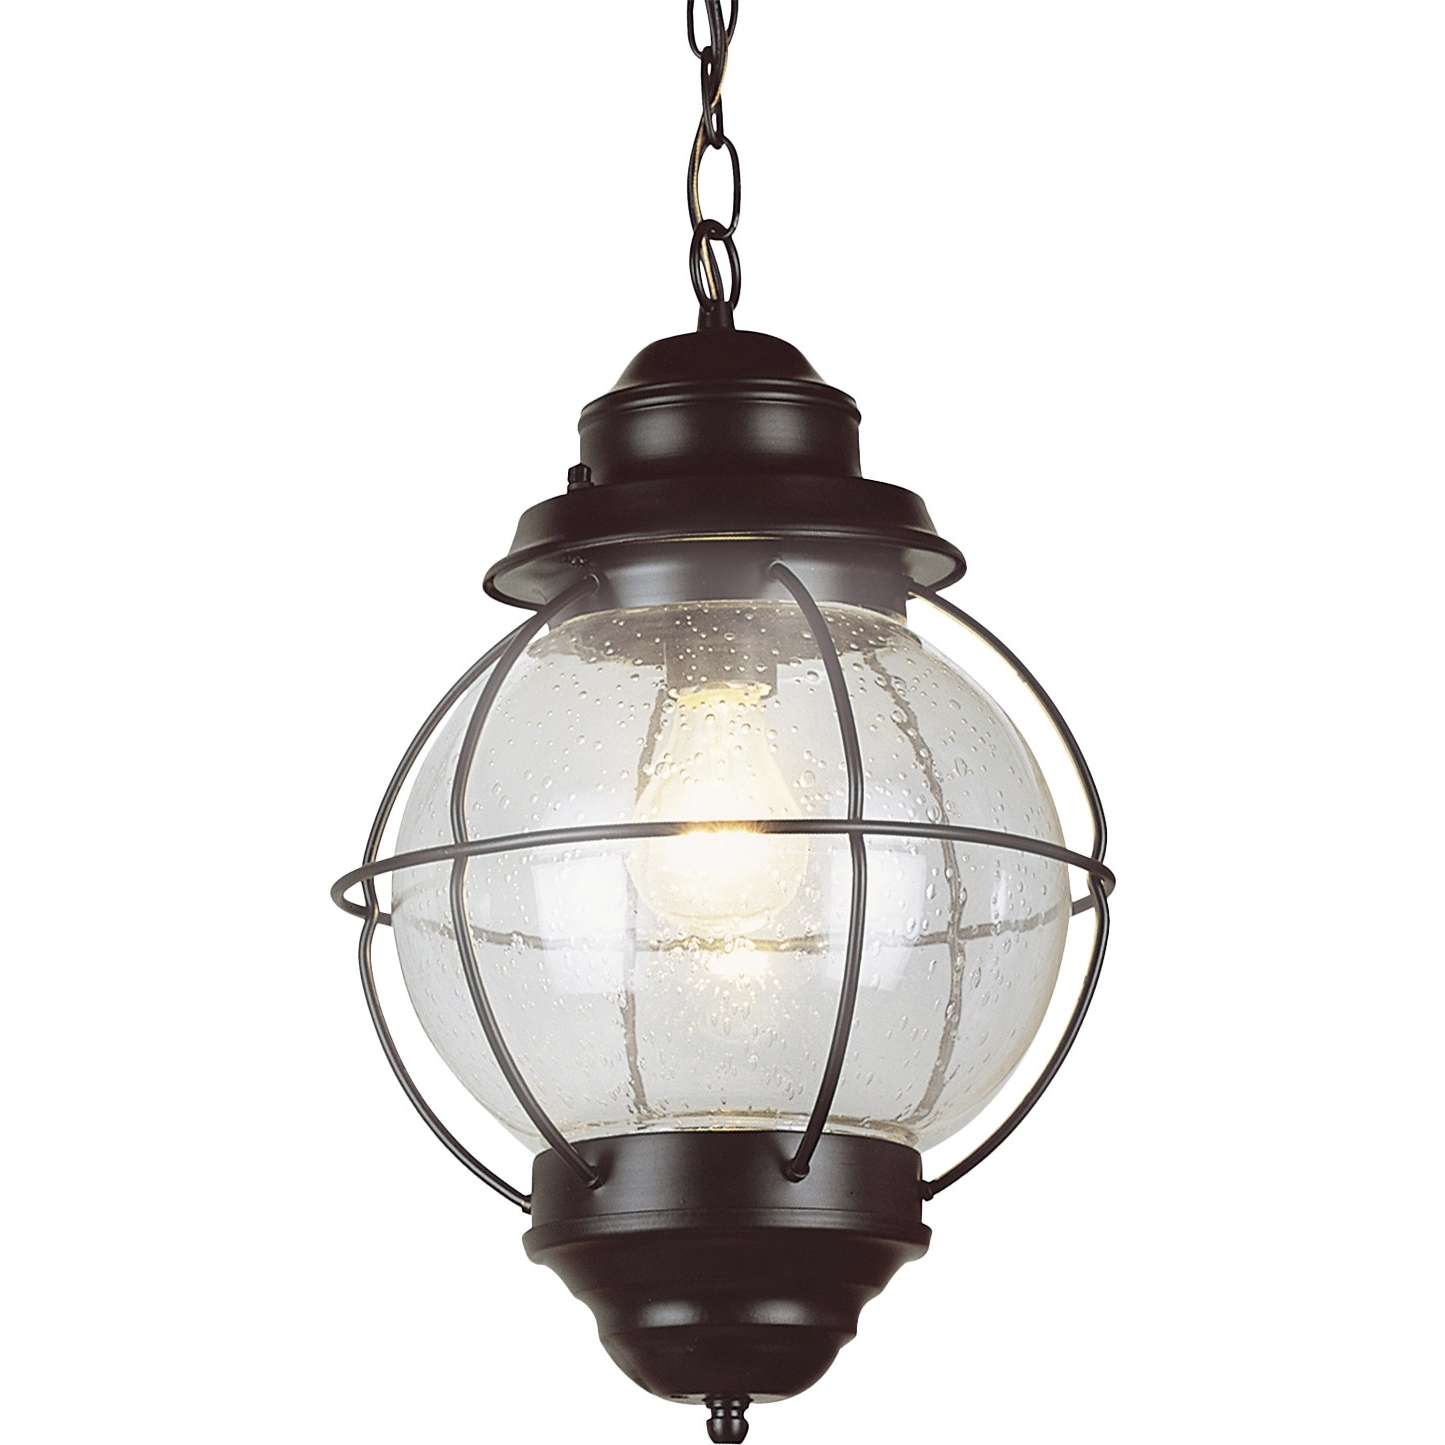 Outdoor Hanging Lights Wayfair 1 Light Lantern ~ Loversiq Intended For Most Up To Date Wayfair Outdoor Hanging Lighting Fixtures (View 12 of 20)